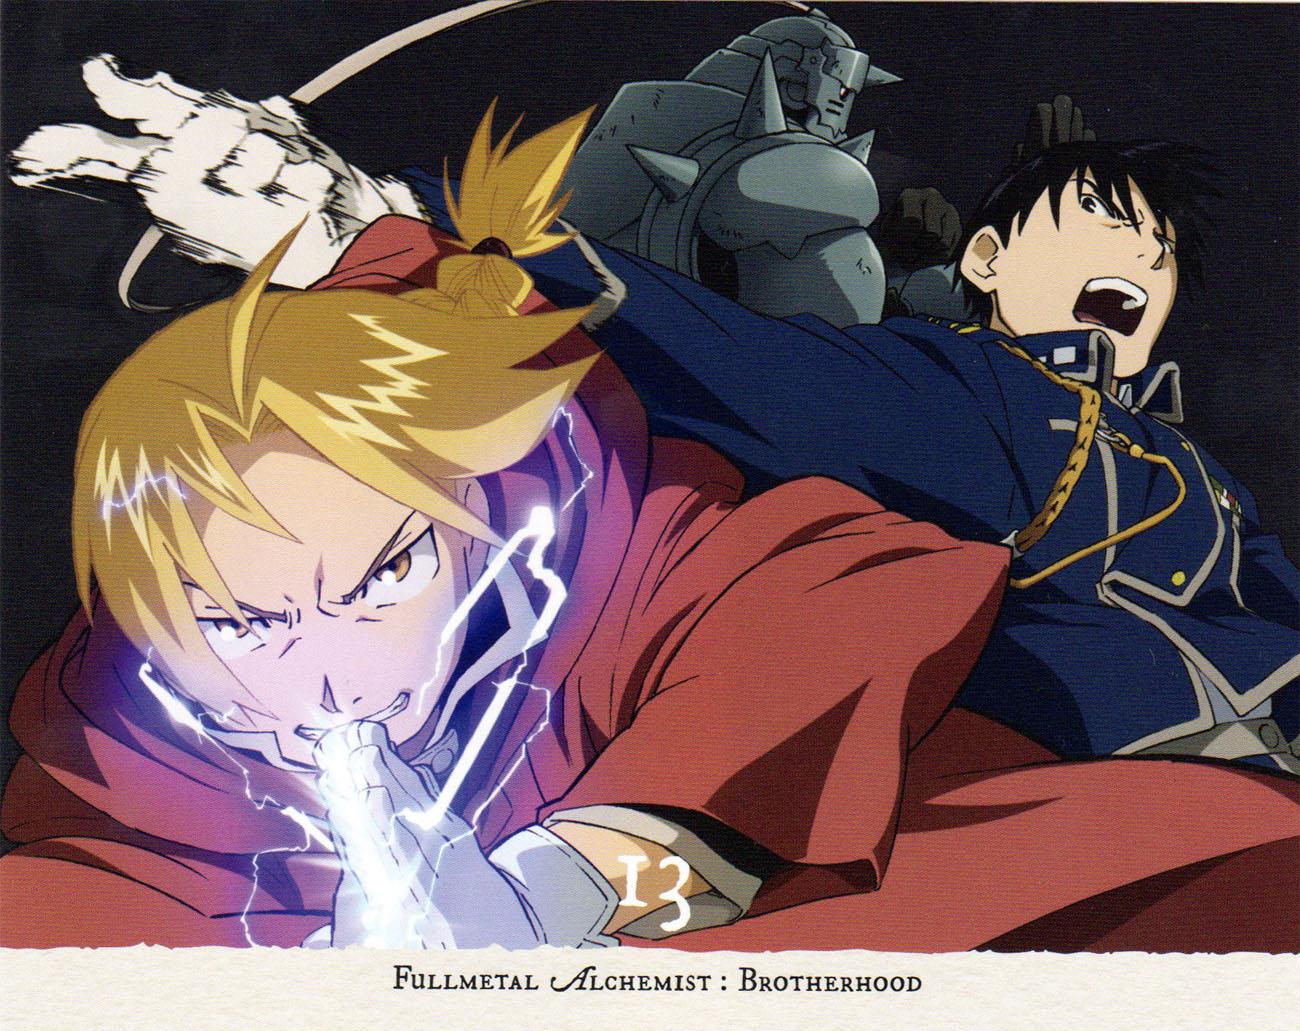 EdwardElric.info » Fullmetal Alchemist Brotherhood